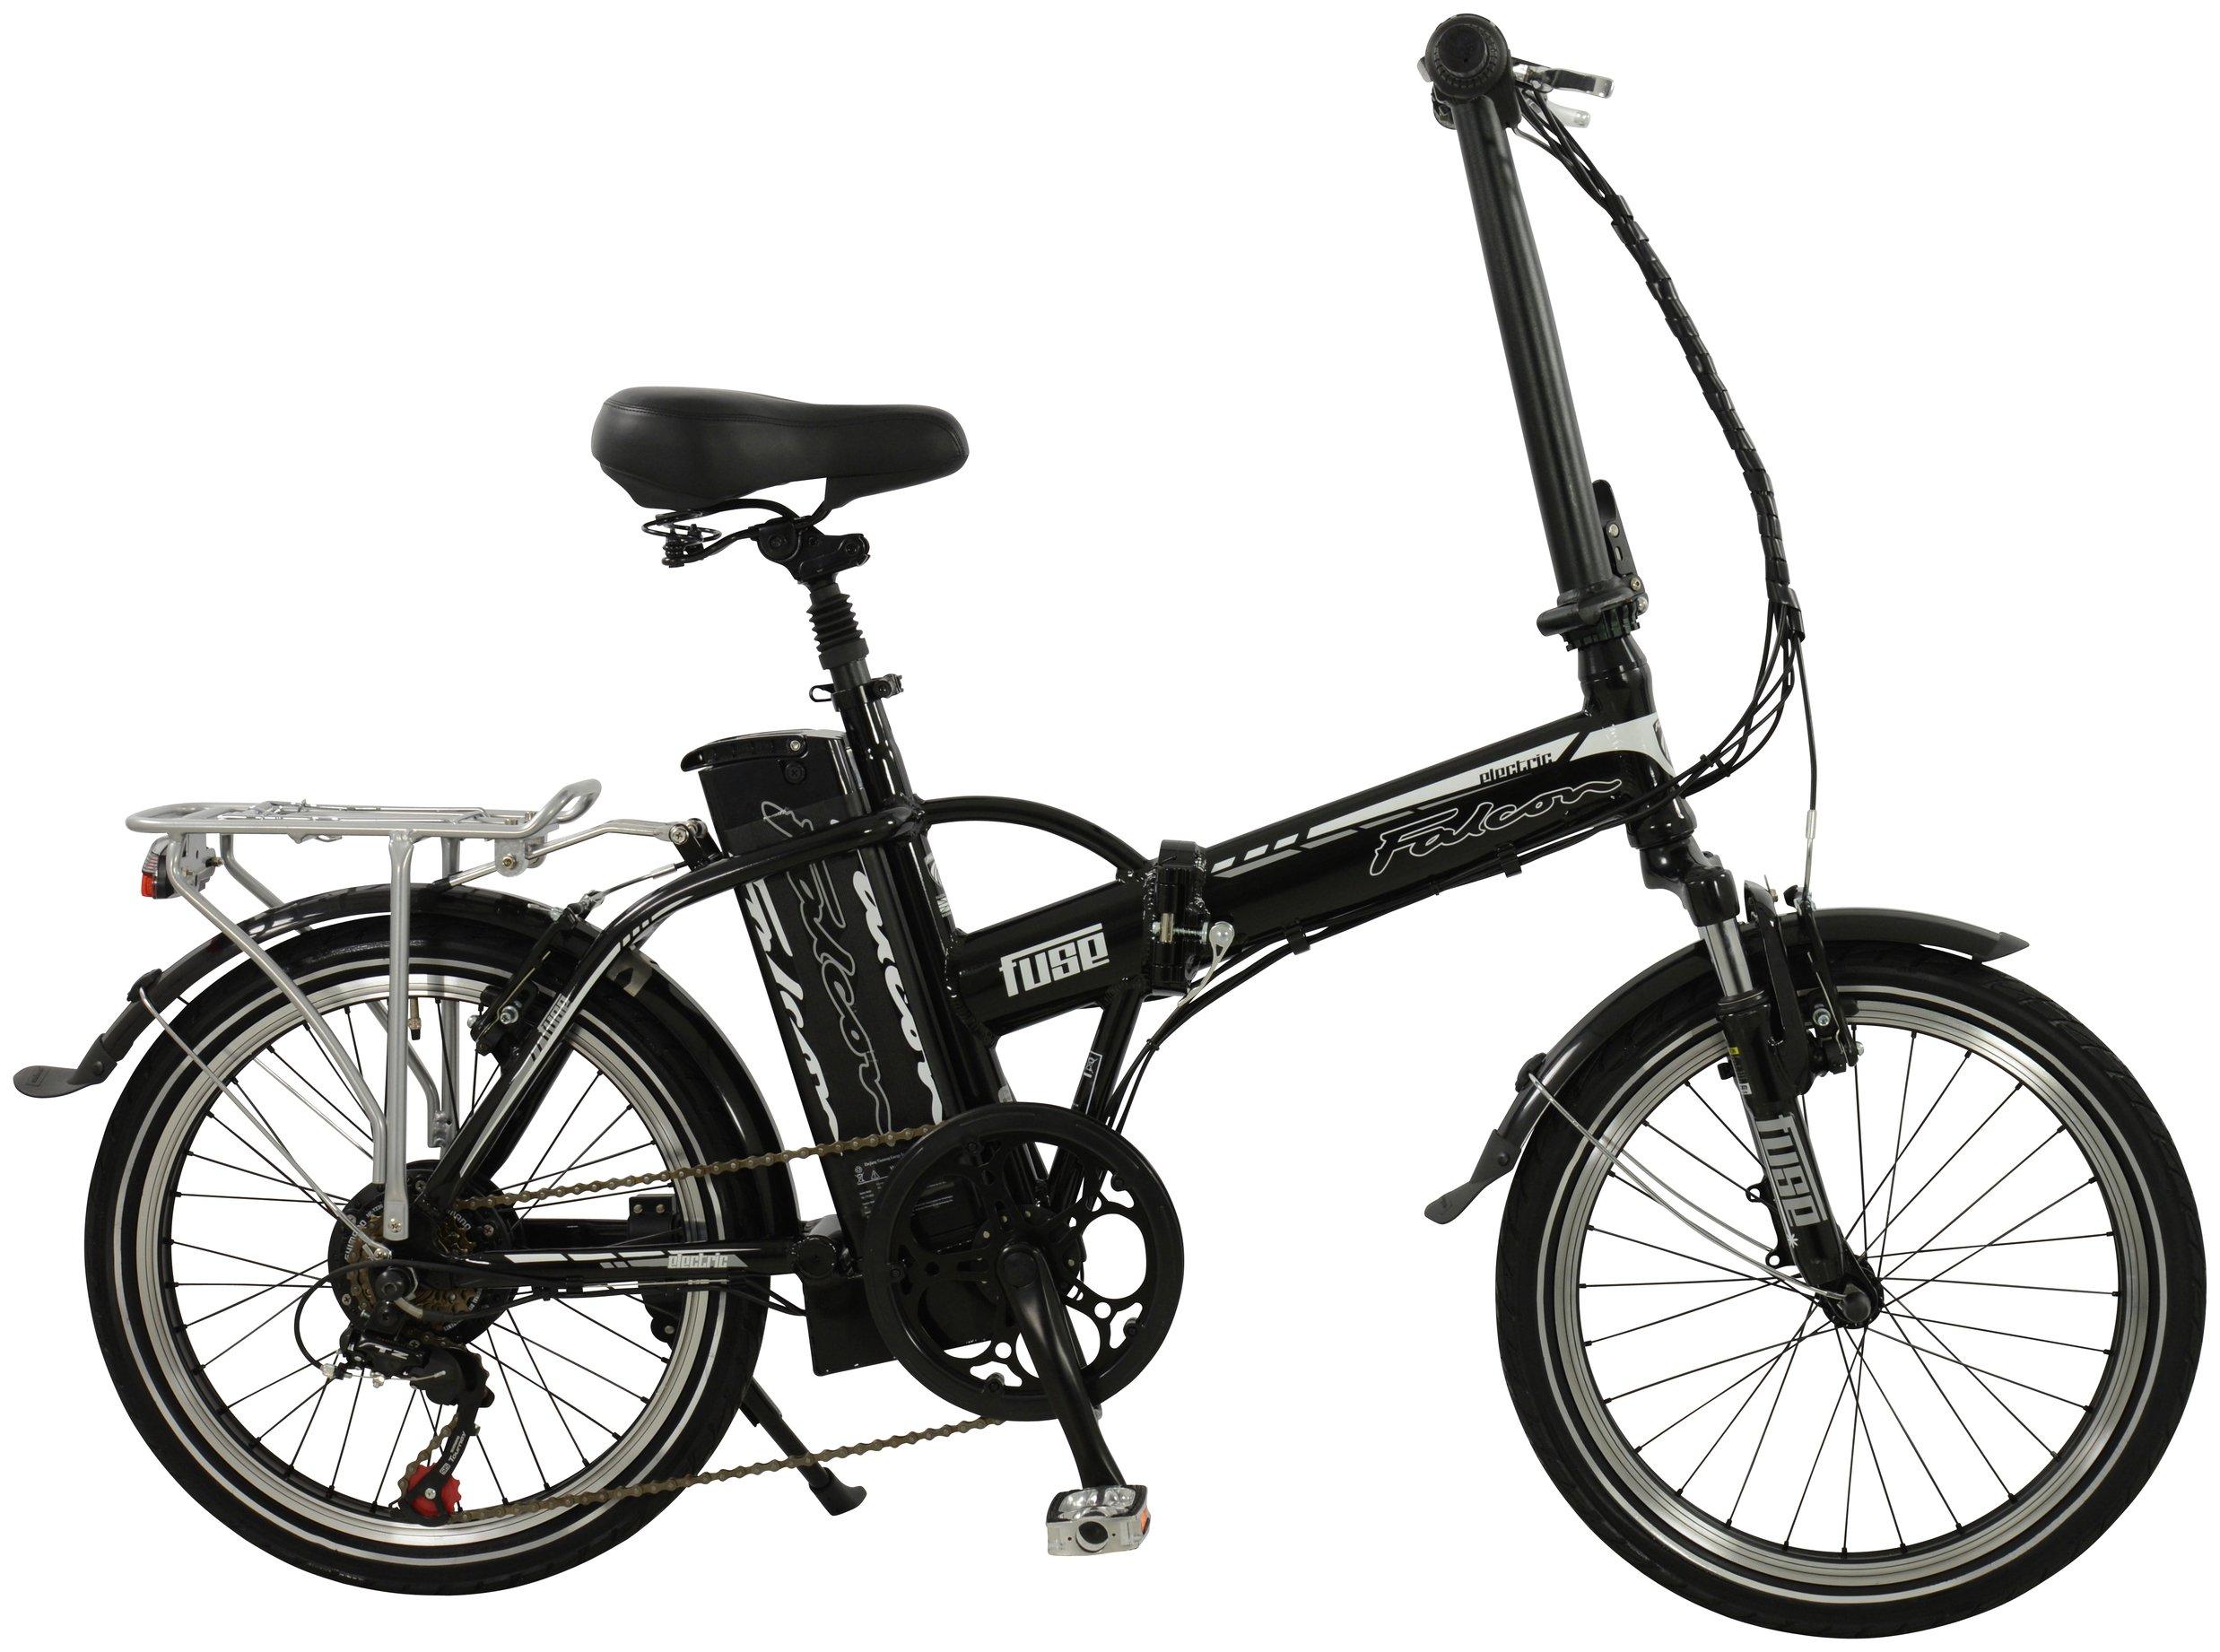 Image of Falcon Fuse Alloy Folding Electric Bike